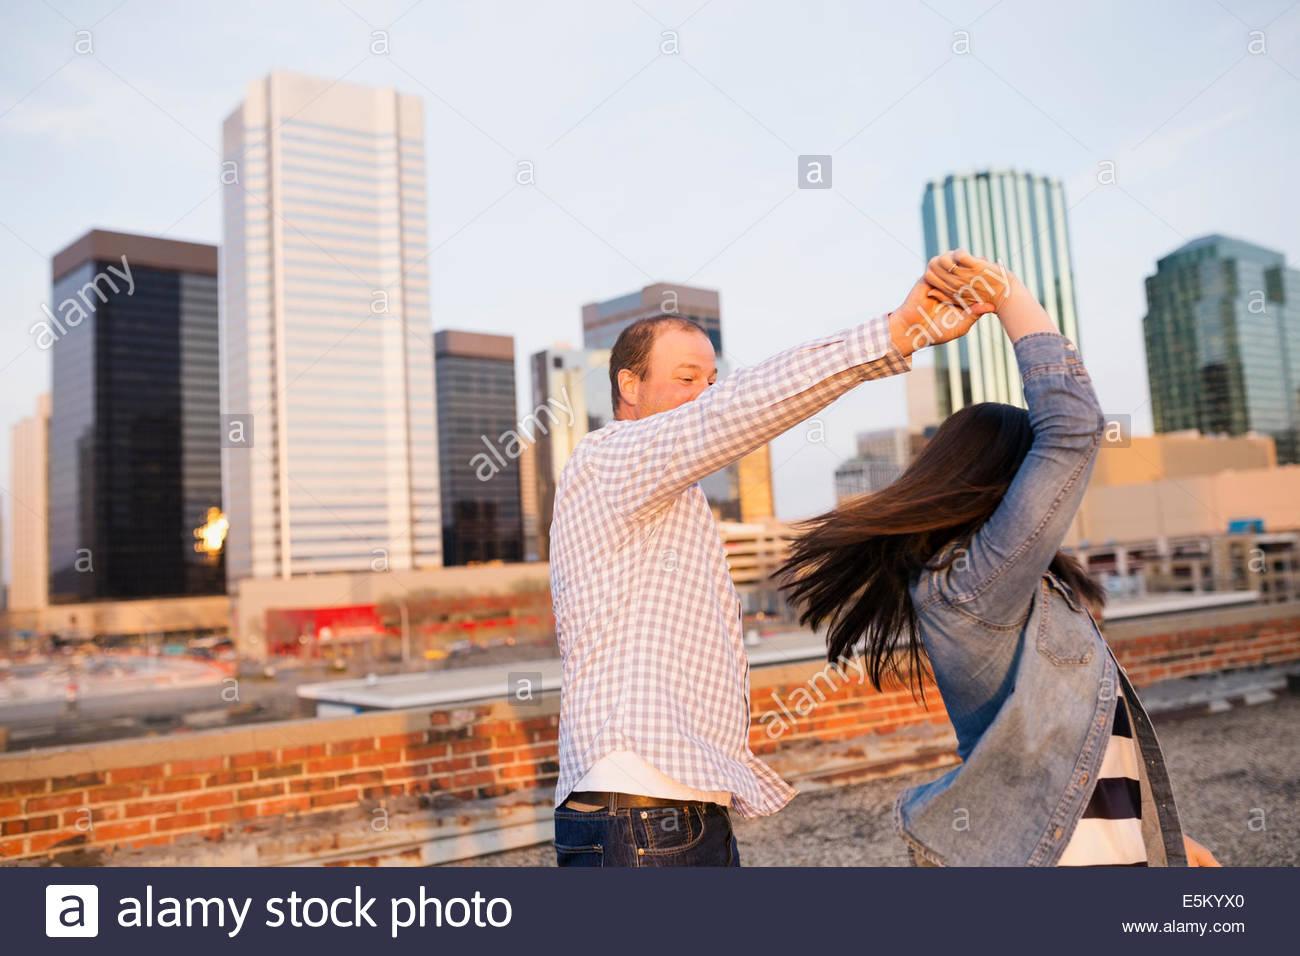 Couple Dancing on urban rooftop Photo Stock